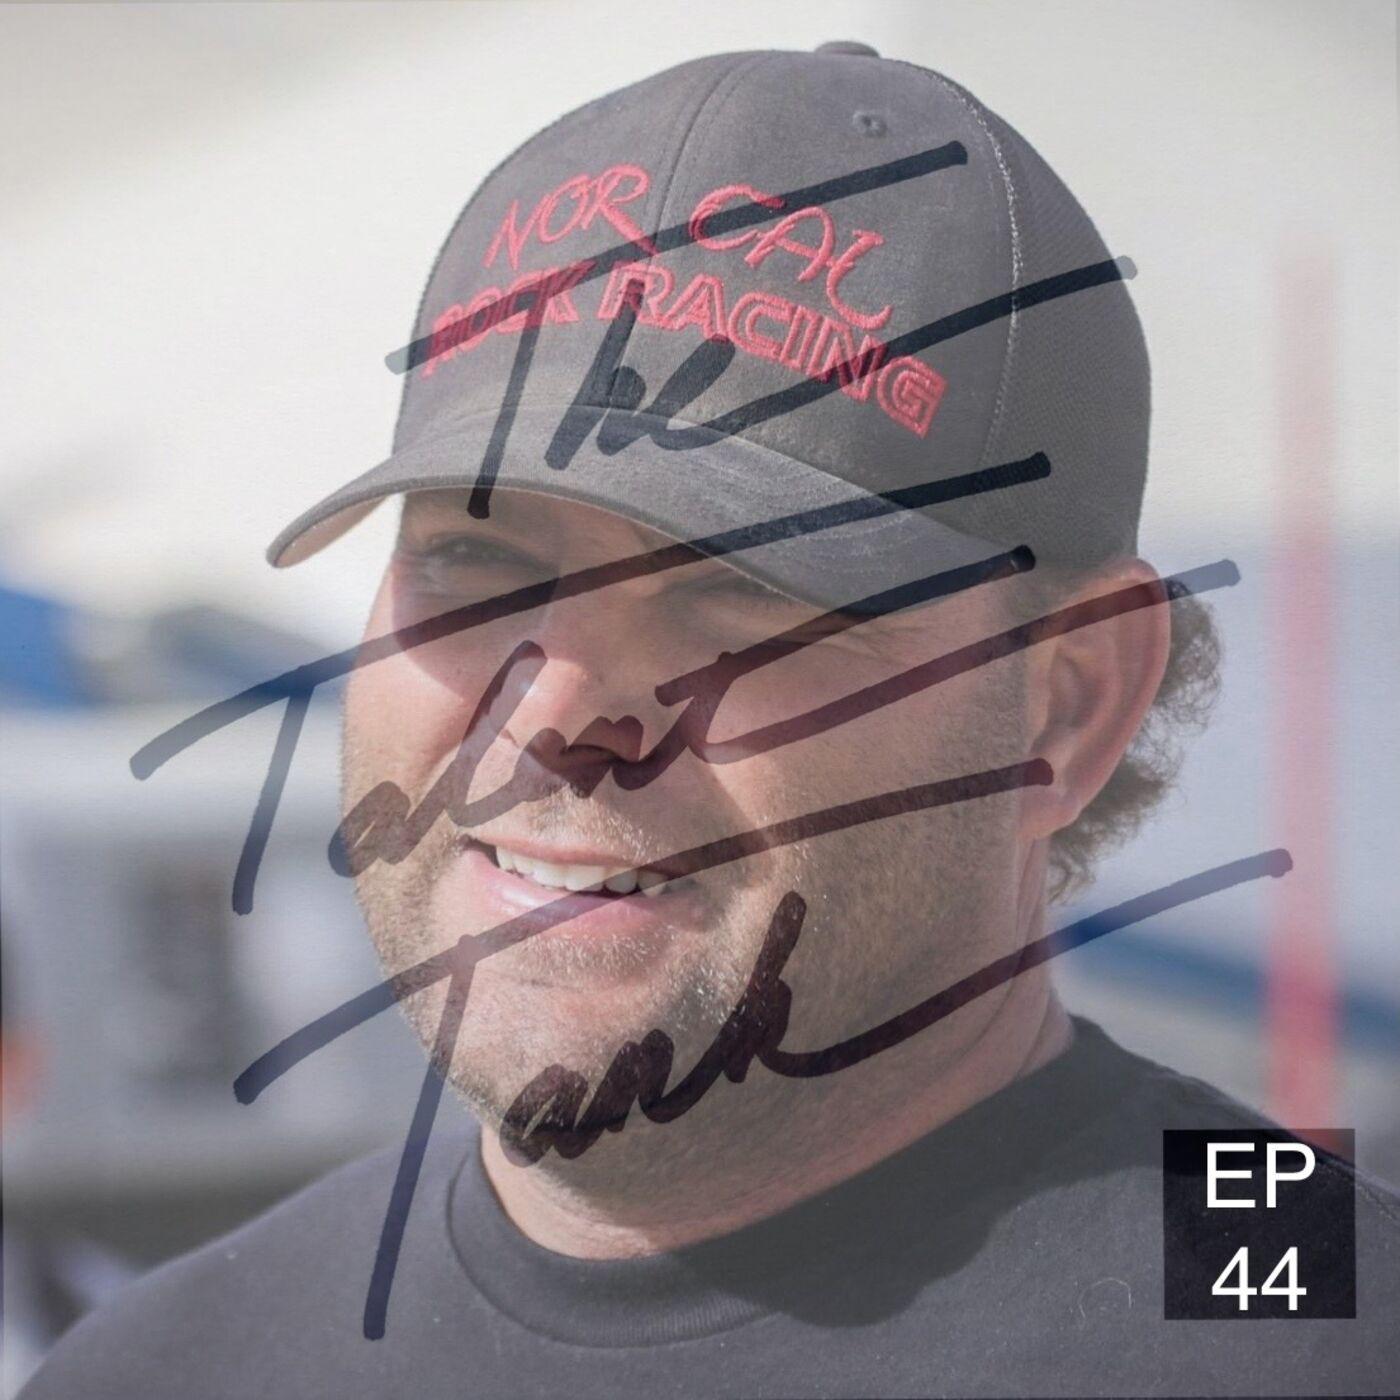 EP 44 John Goodby